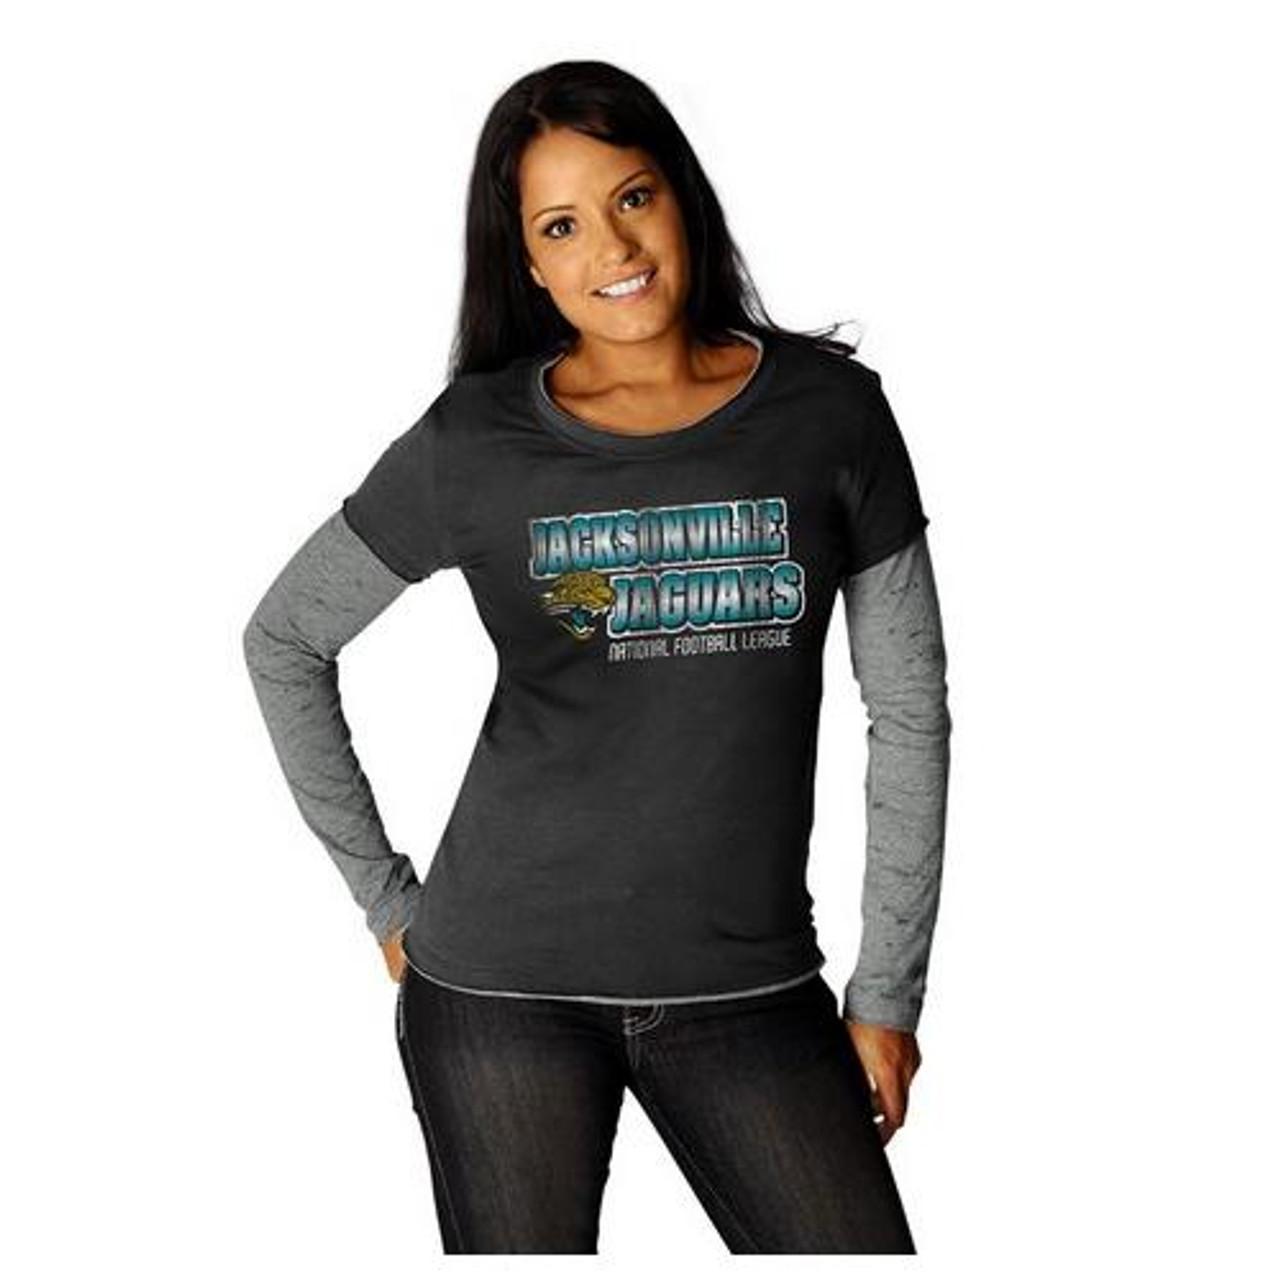 Jacksonville Jaguars Women's Layered Long Sleeve Tee